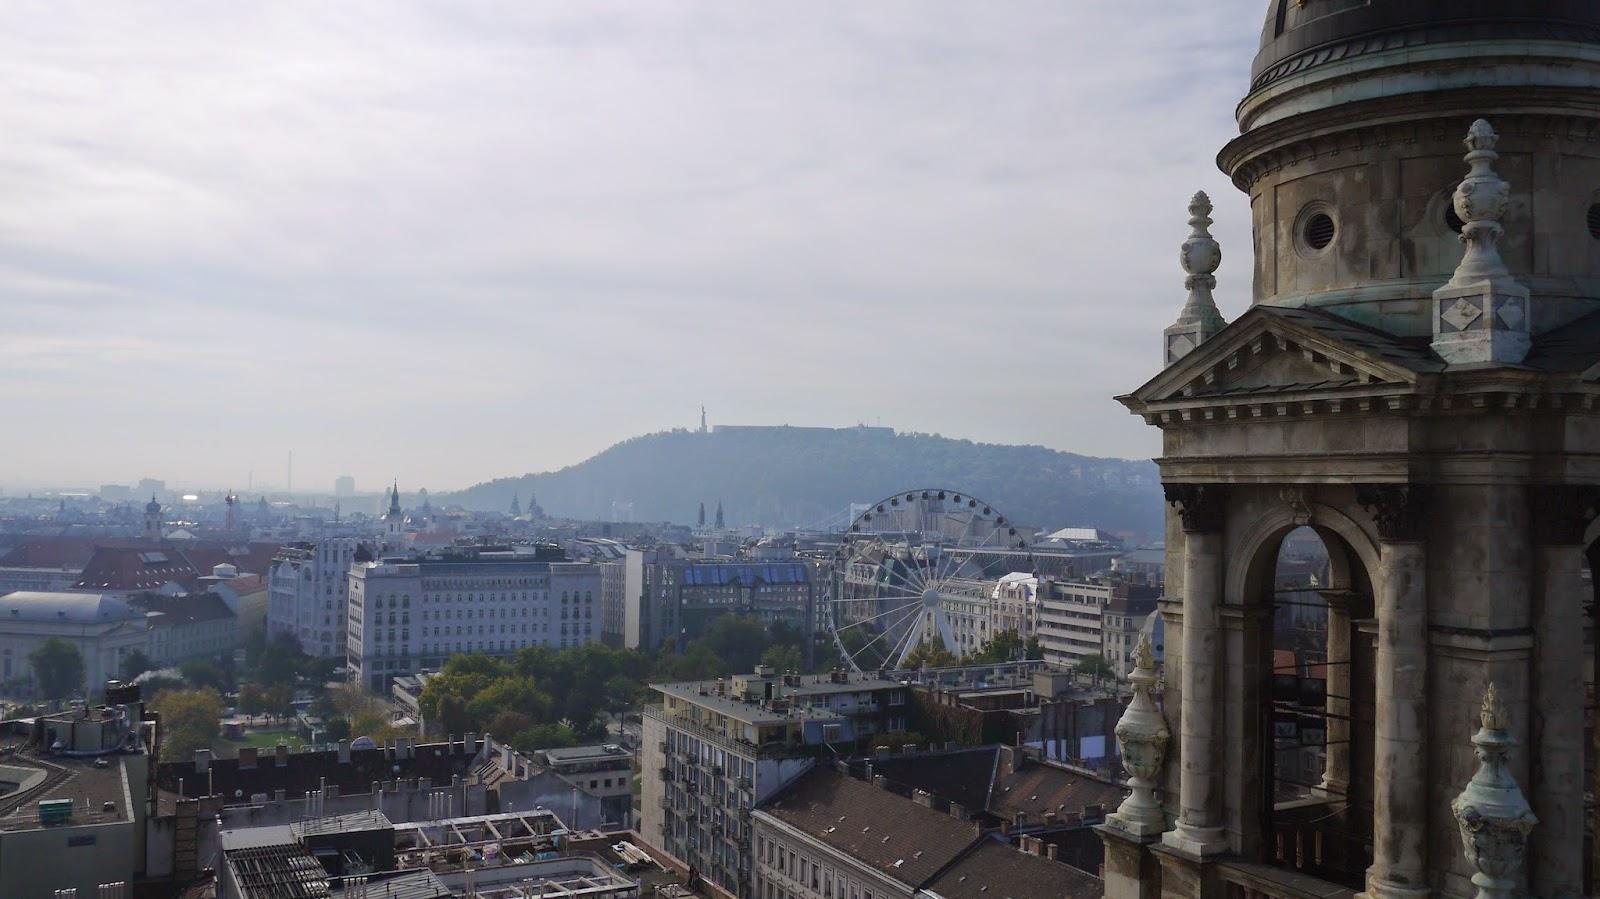 St Stephen's Basilica Budapest Dome